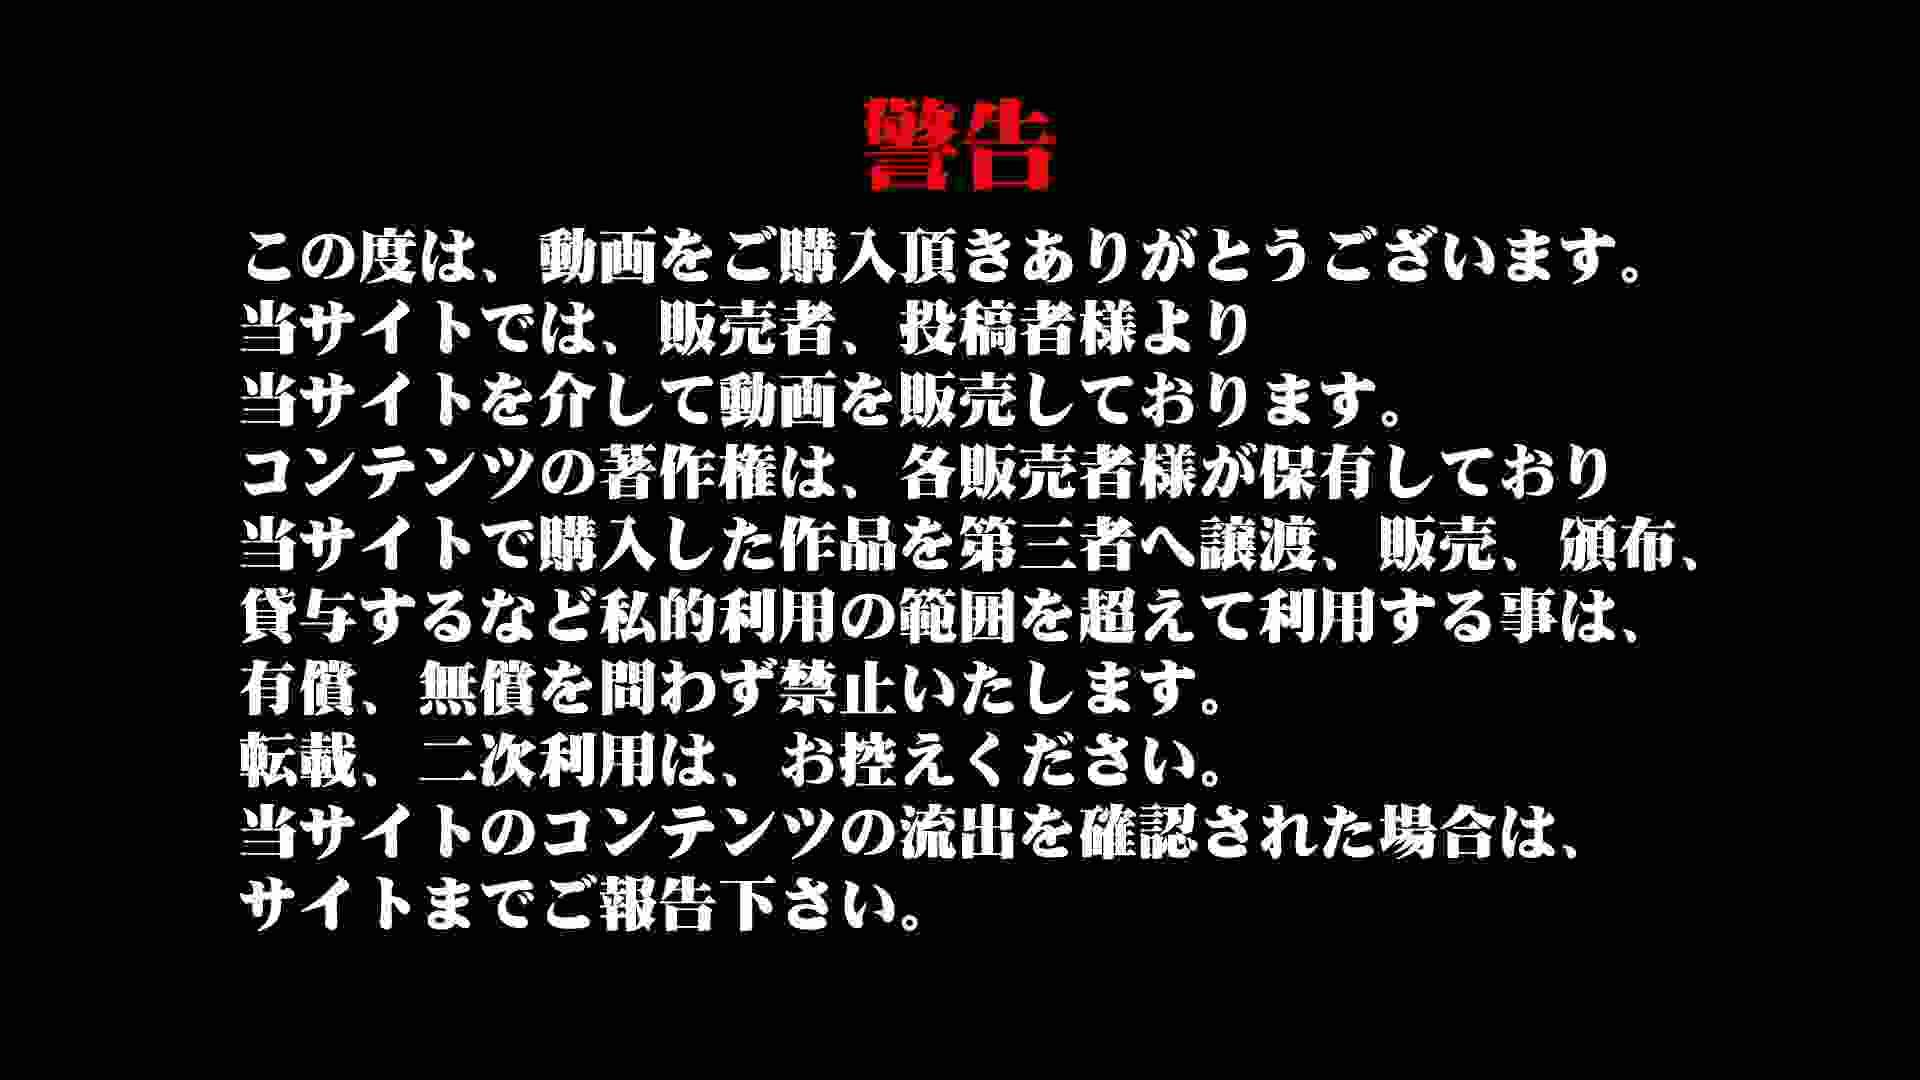 Aquaな露天風呂Vol.887 盗撮特撮 | 露天  10pic 1